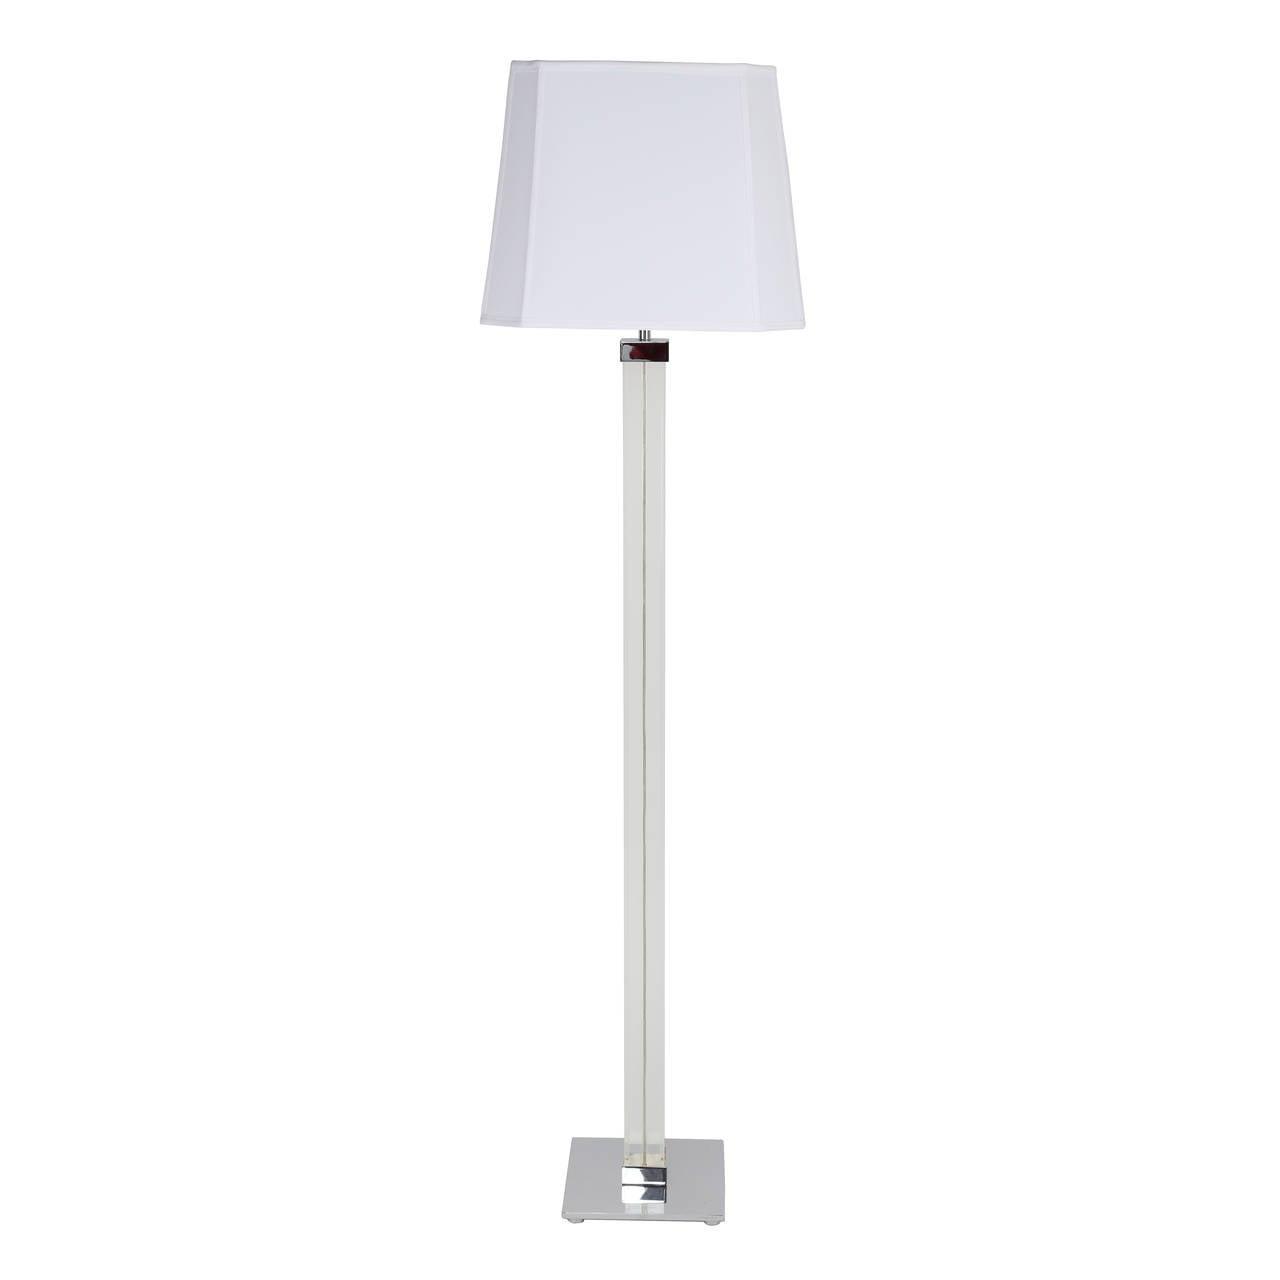 Karl springer lucite and nickel floor lamp at 1stdibs for Linear floor lamp with rectangular white shade